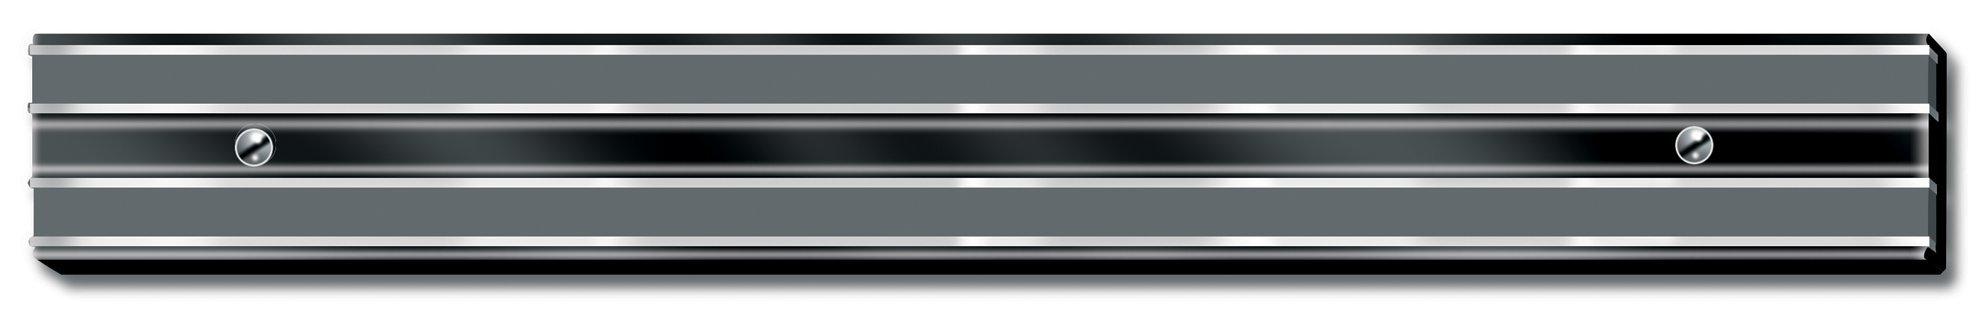 Victorinox 12-Inch Long Magnetic Knife Bar, Black